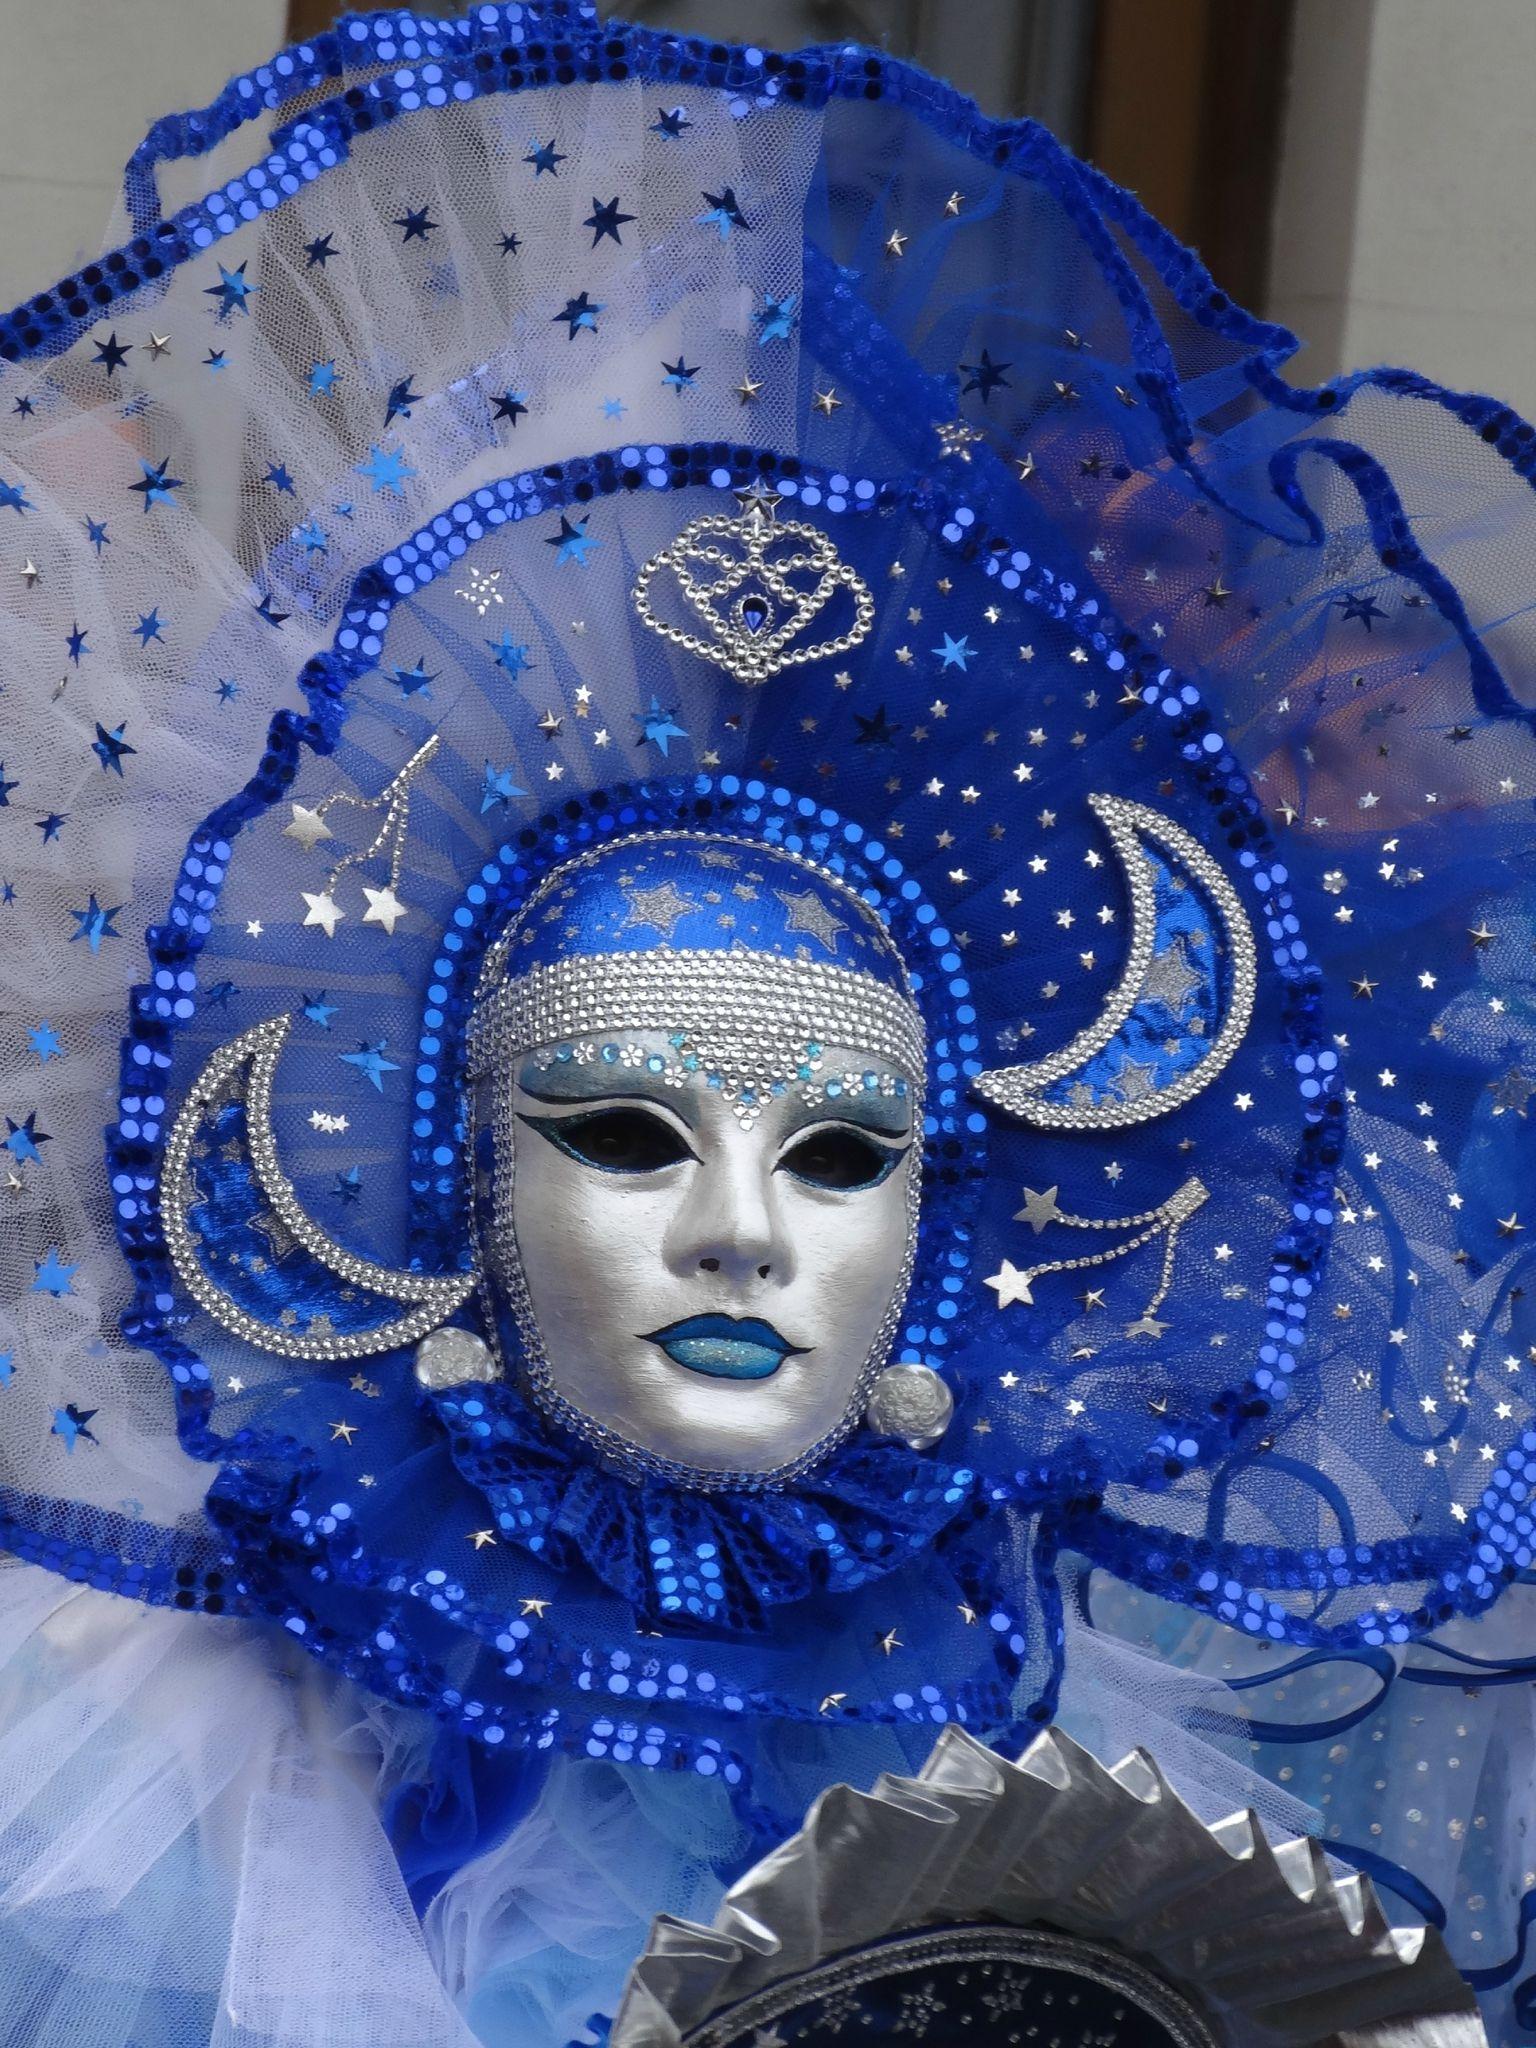 carnaval venitien castres venitian mask carnaval devenise en 2019 pinterest carnaval. Black Bedroom Furniture Sets. Home Design Ideas